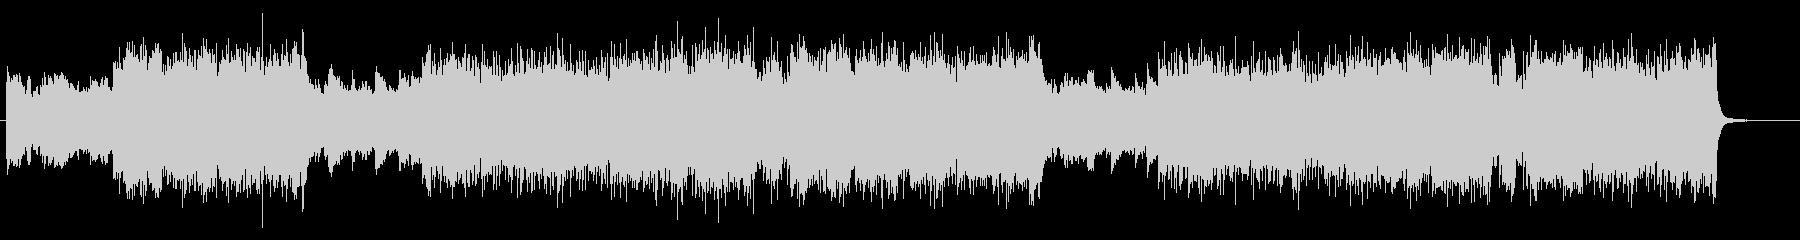 HEAVYROCK・DARK 283の未再生の波形